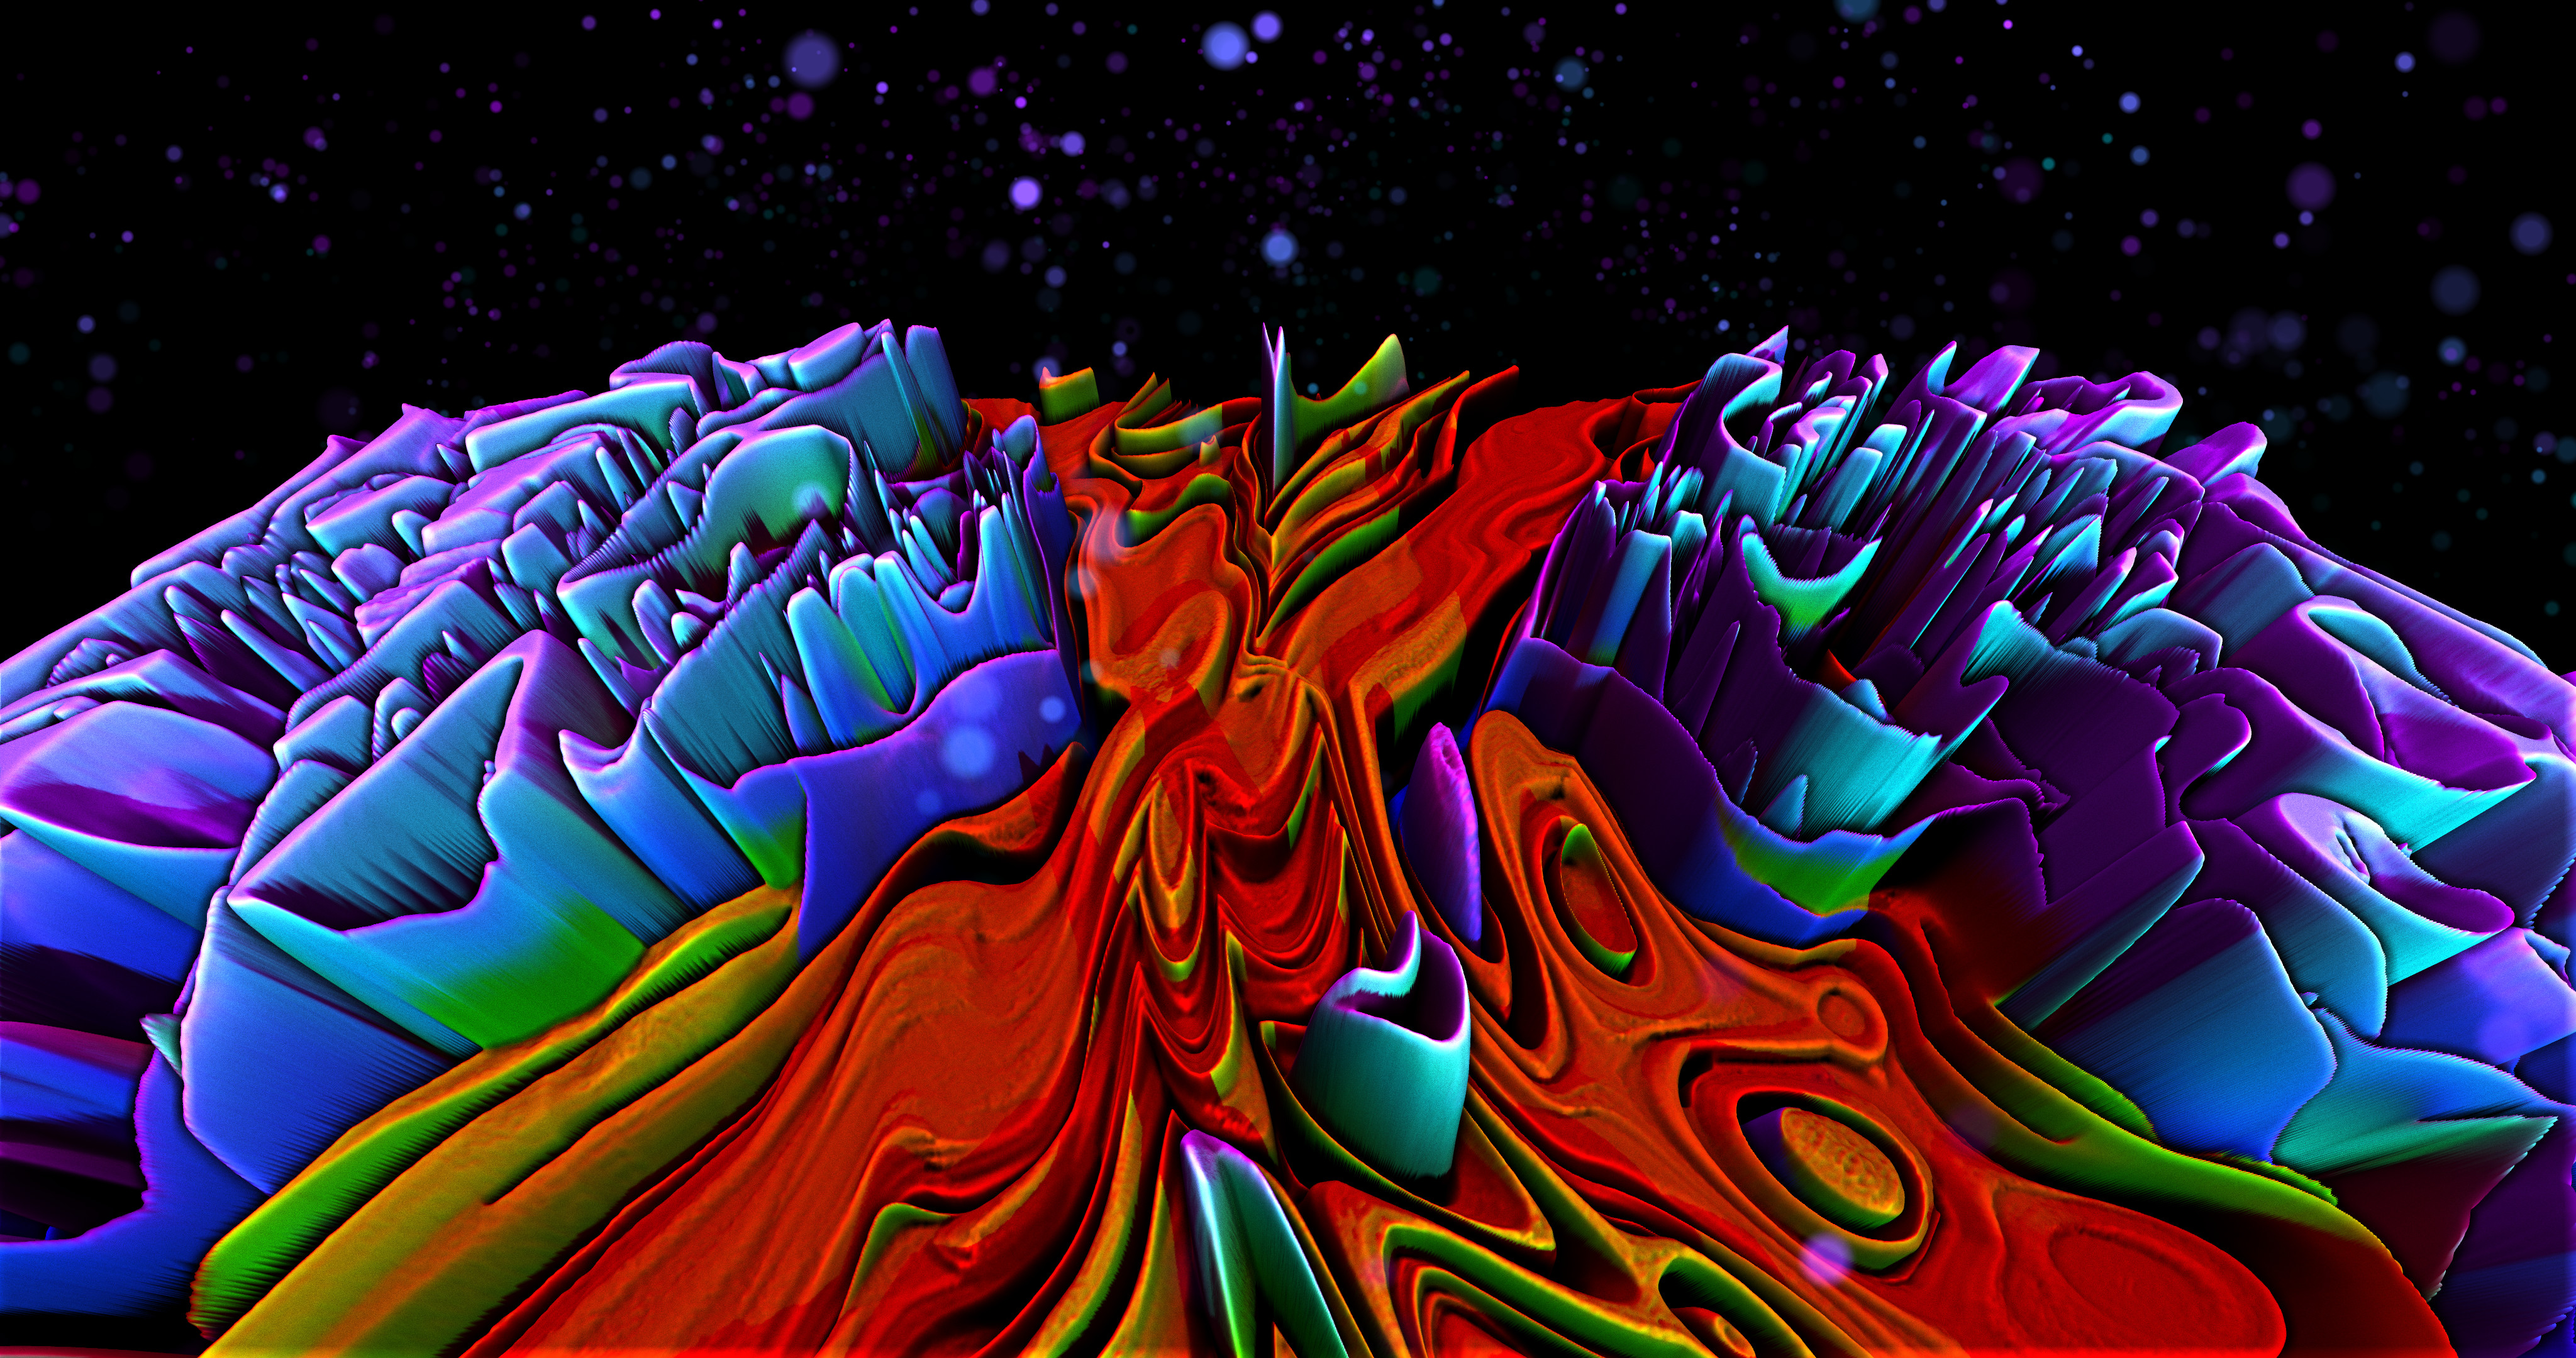 free rainbow lava 4k wallpaper by xxstryverxx on deviantart